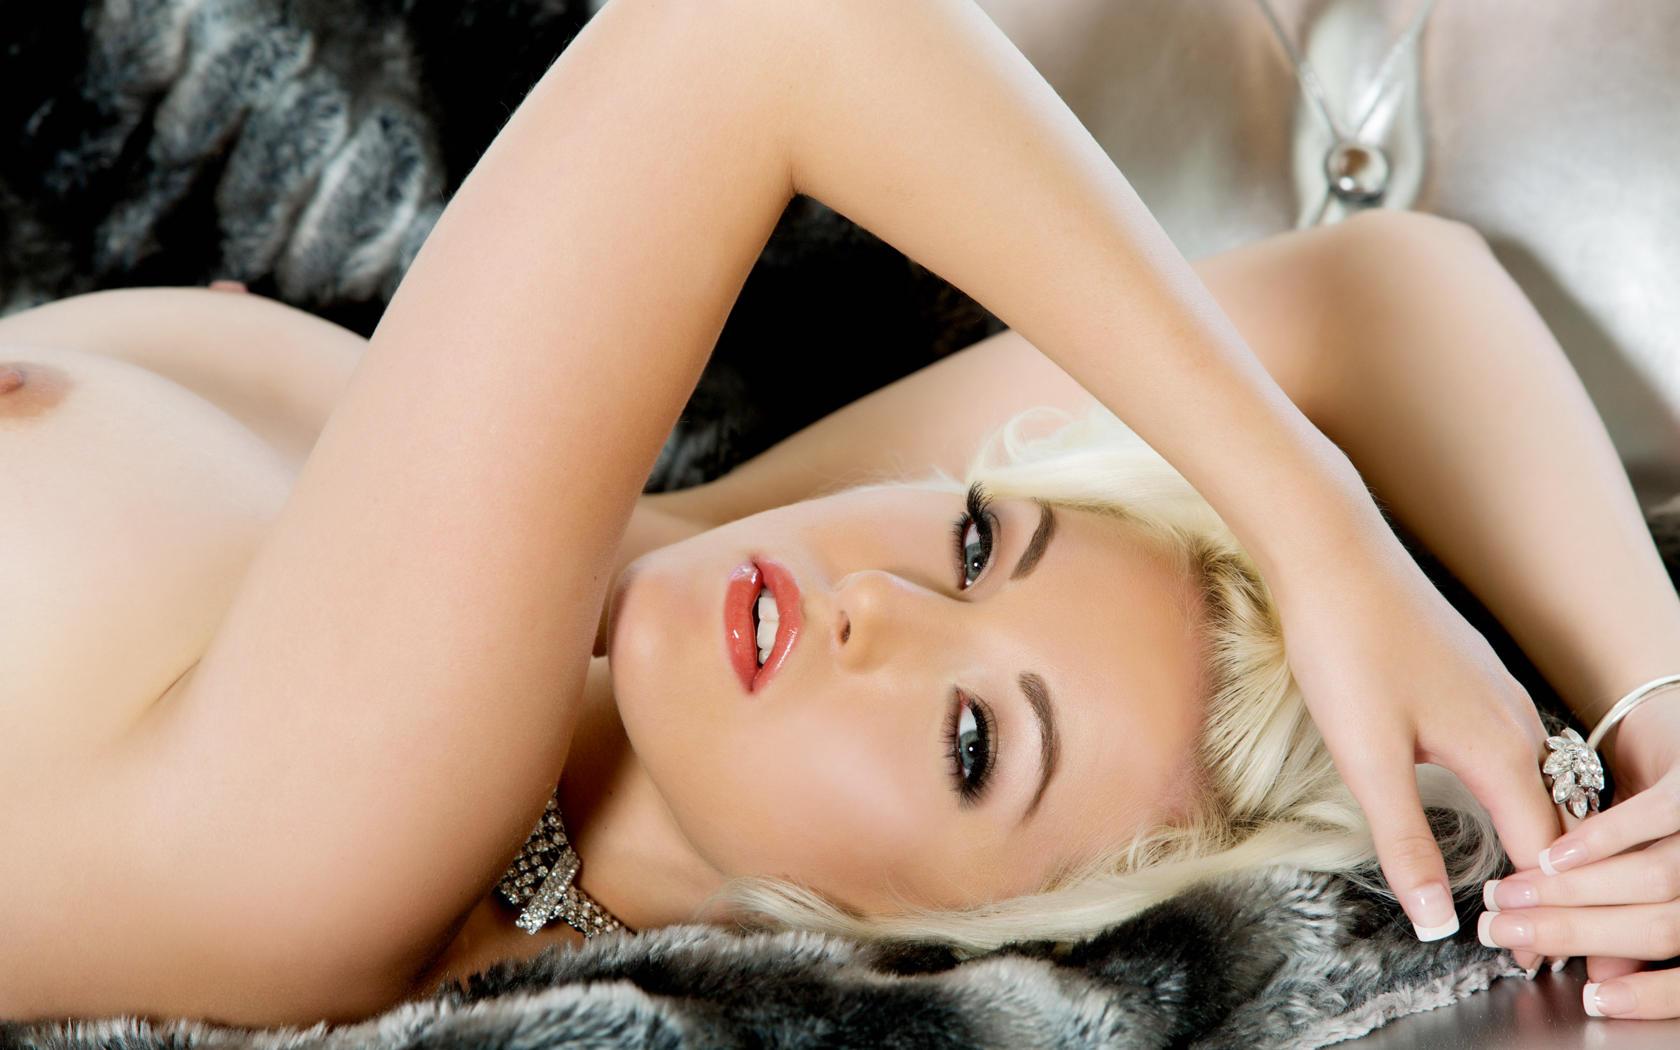 download photo 1680x1050 jenna ivory amazing sexy girl